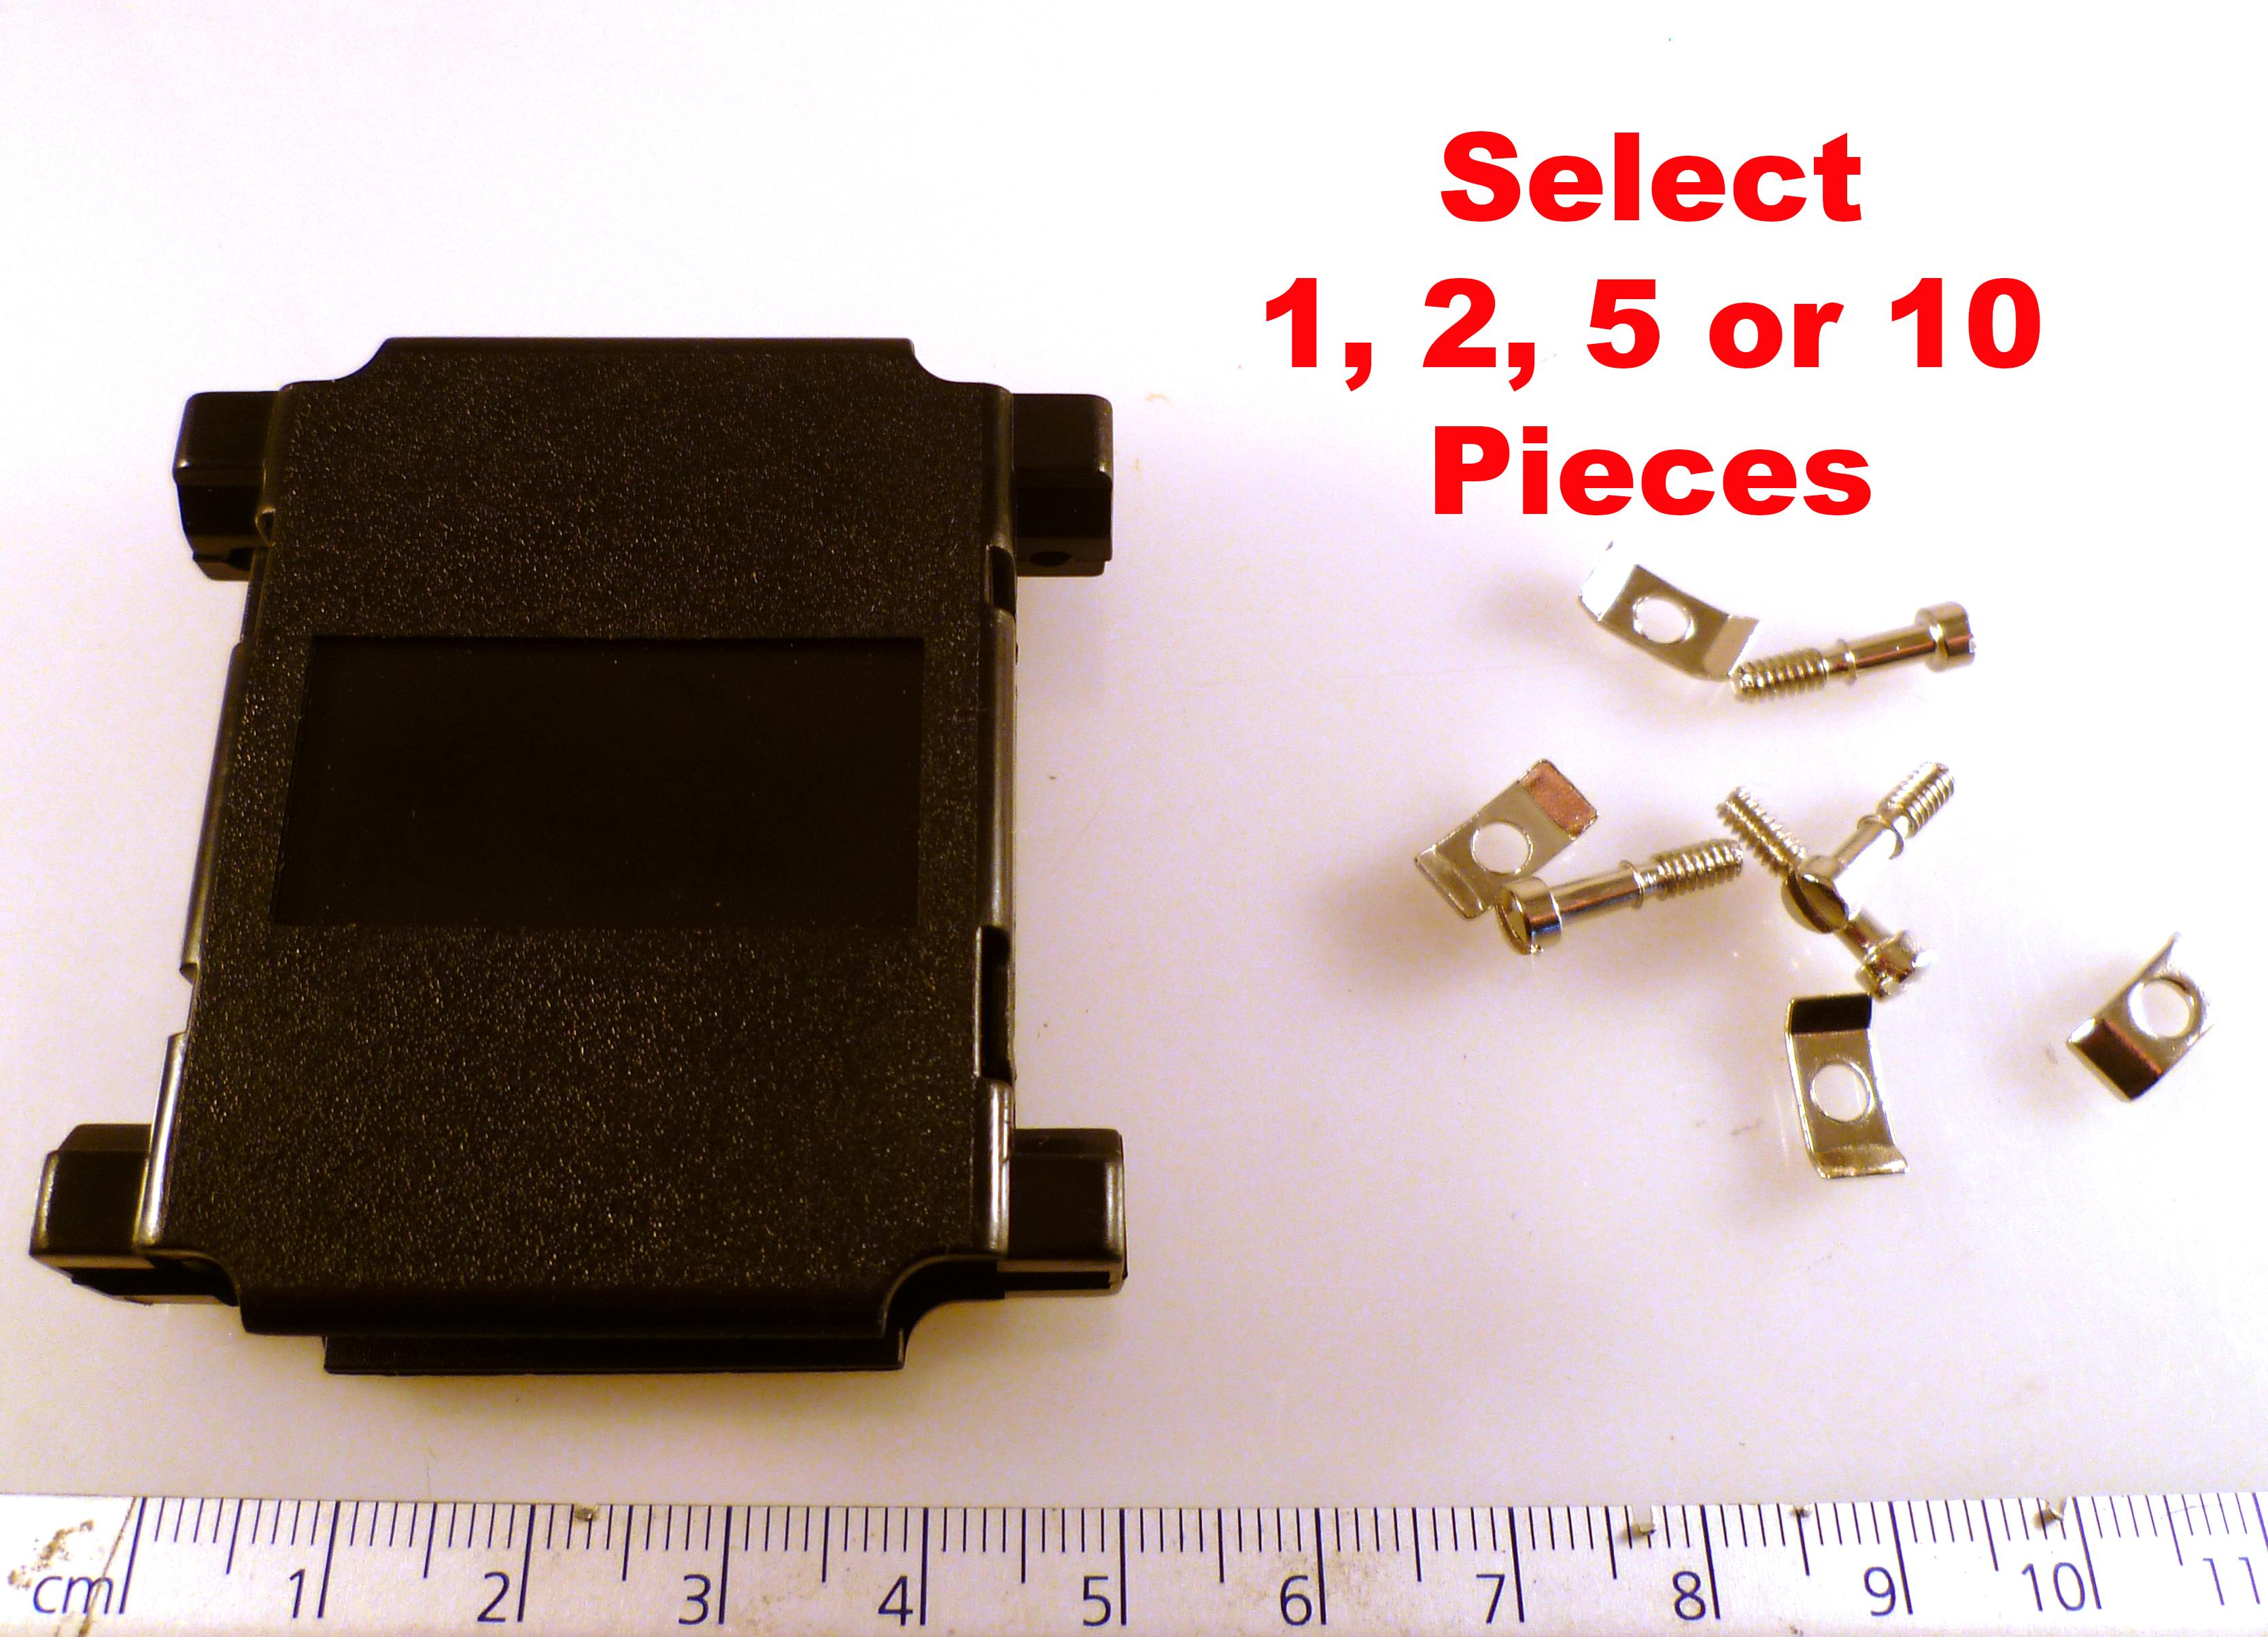 D Type 9 Way ABS Screw Lock Cover Easy Grip Black OM0254C